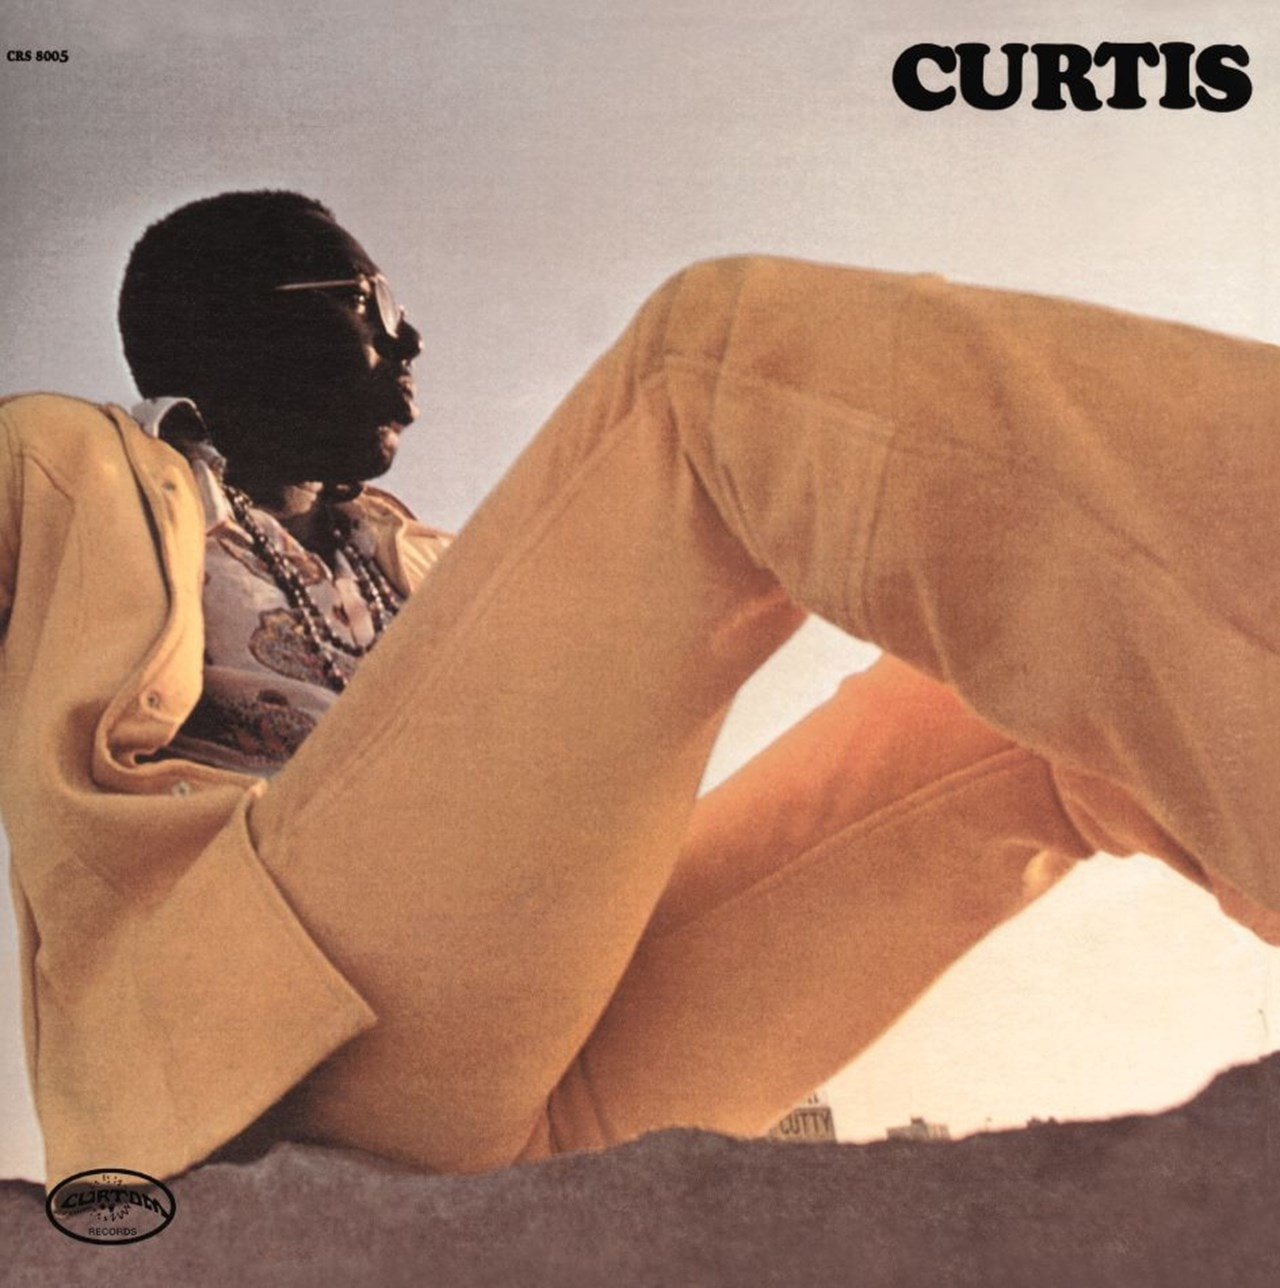 Curtis - 1